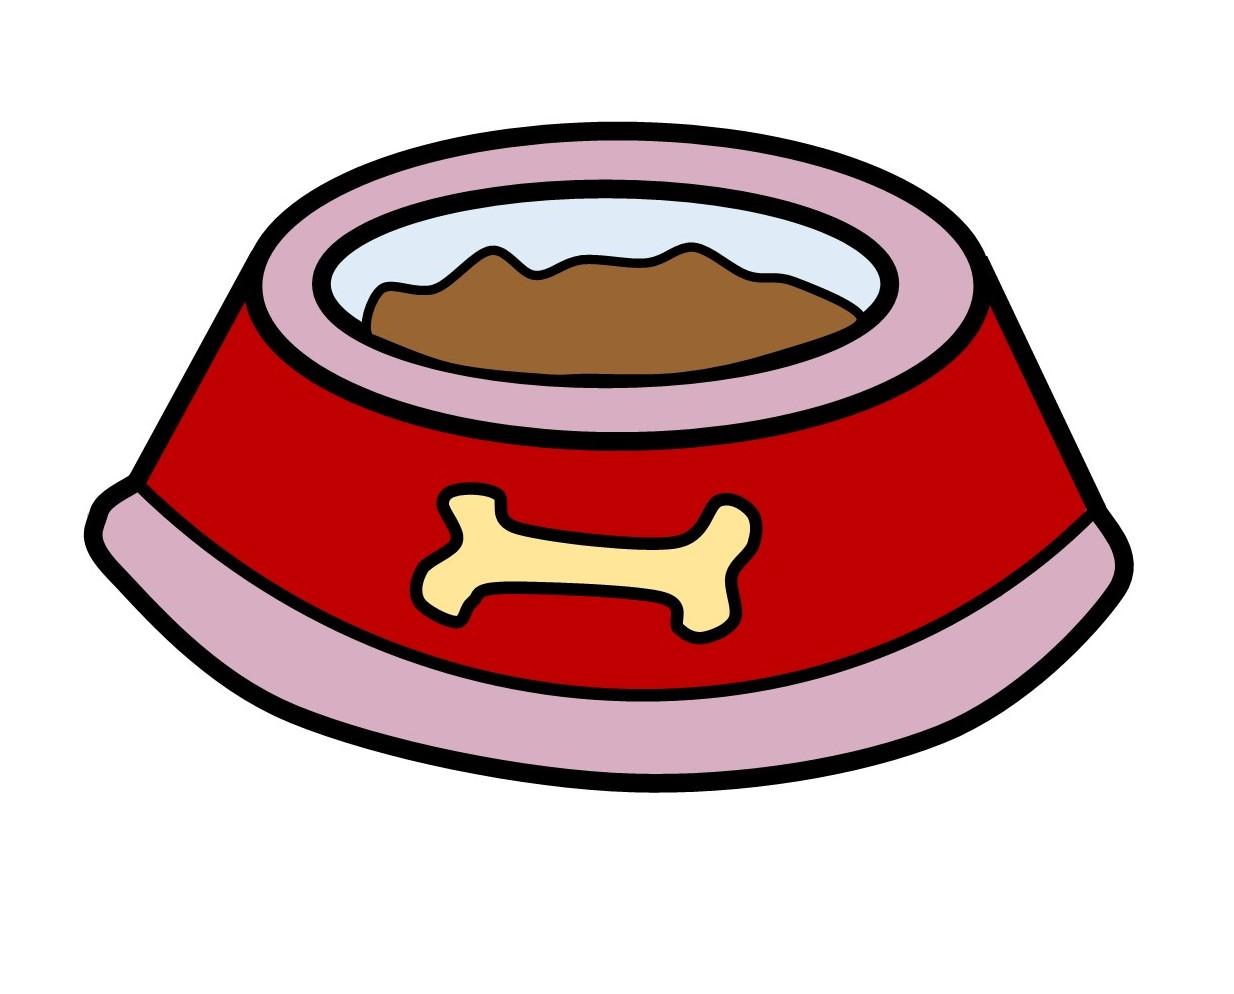 dogbowl.jpg